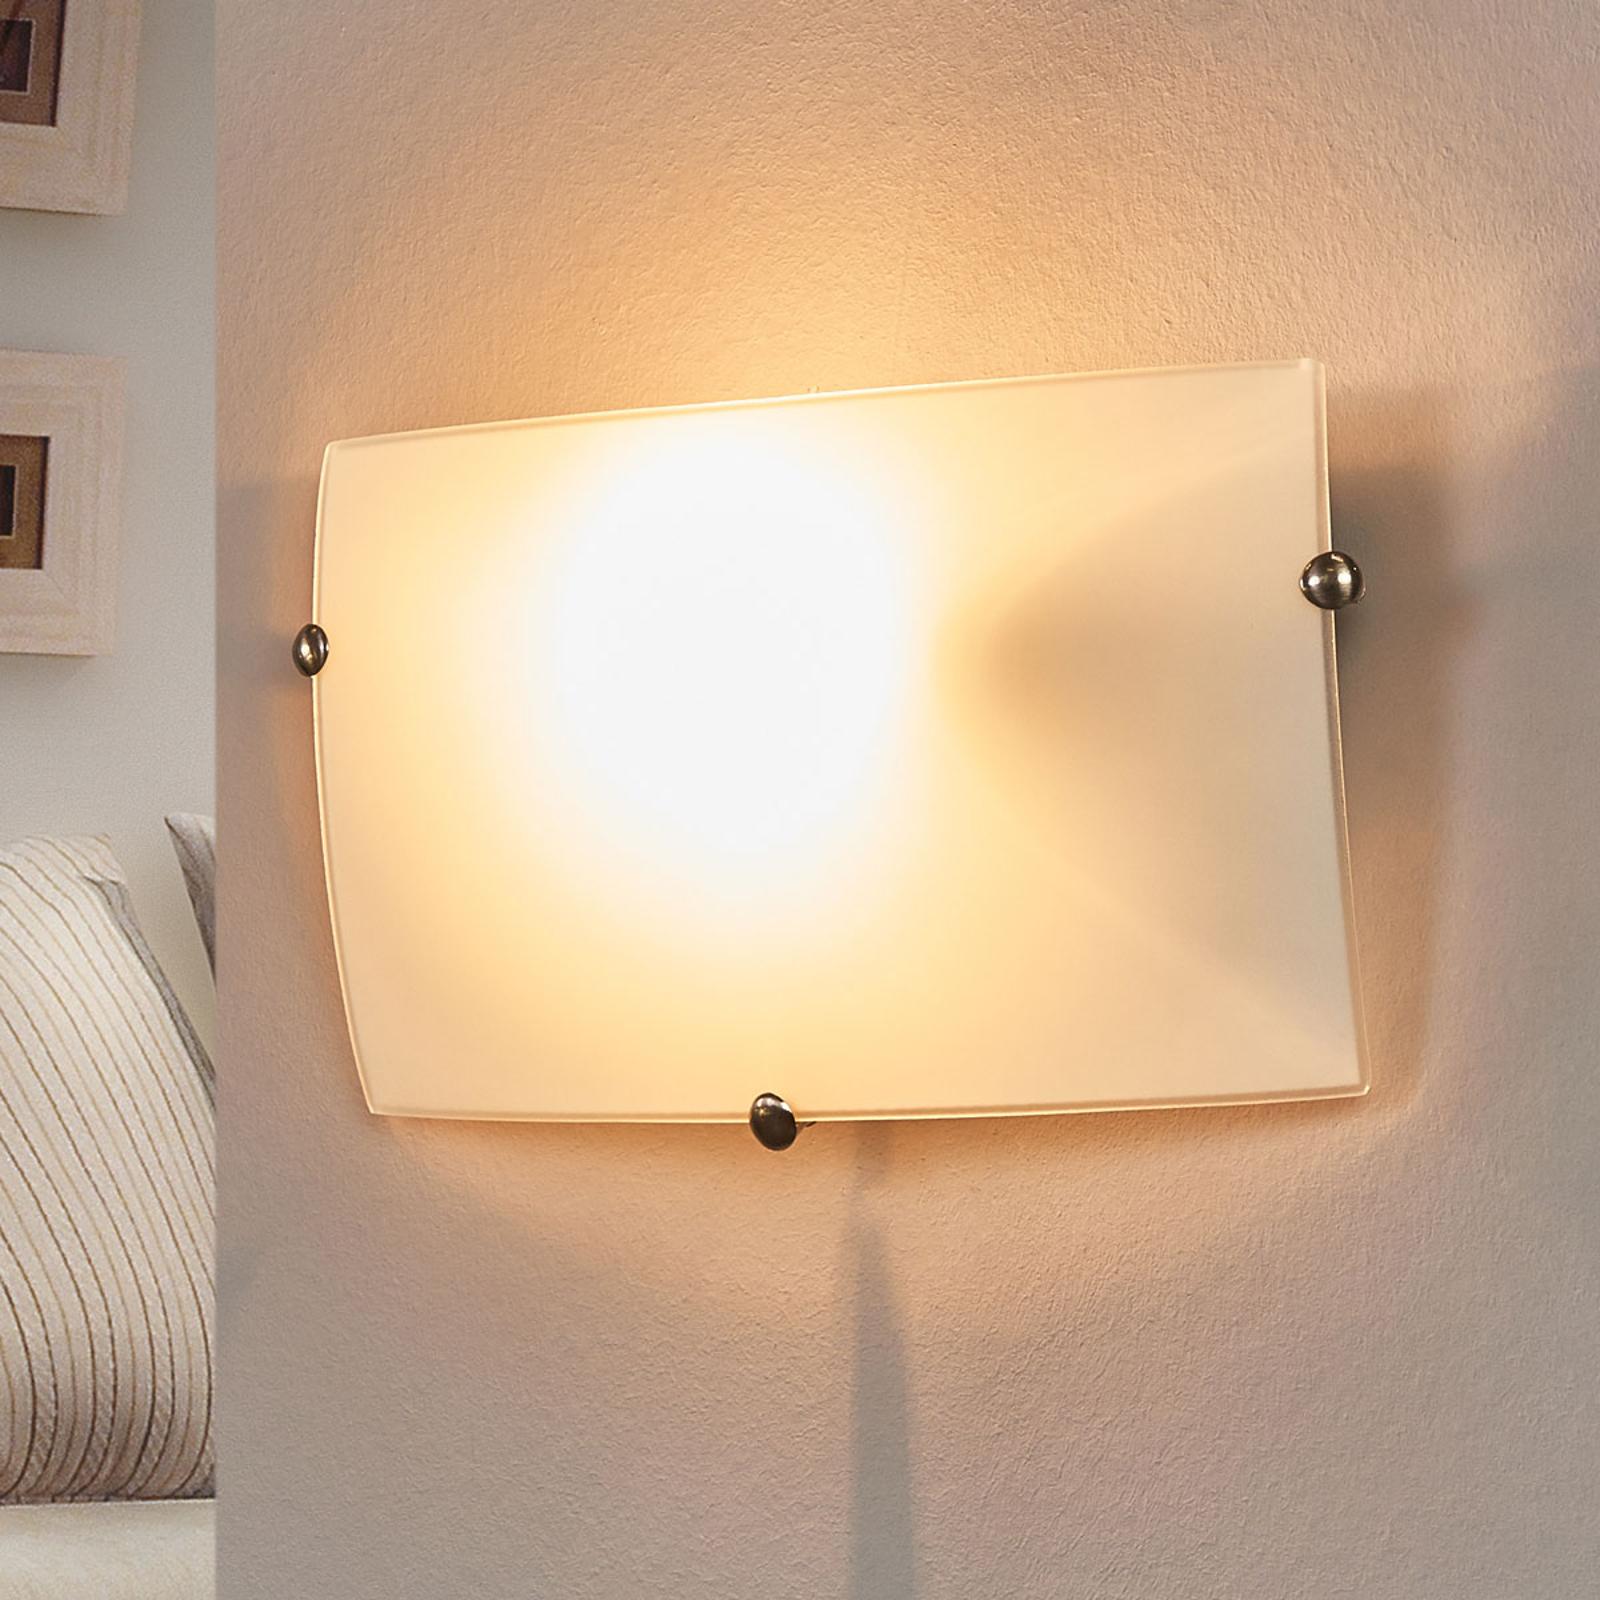 Sleek Liria 1 Wall Lamp made of Glass_3506523_1